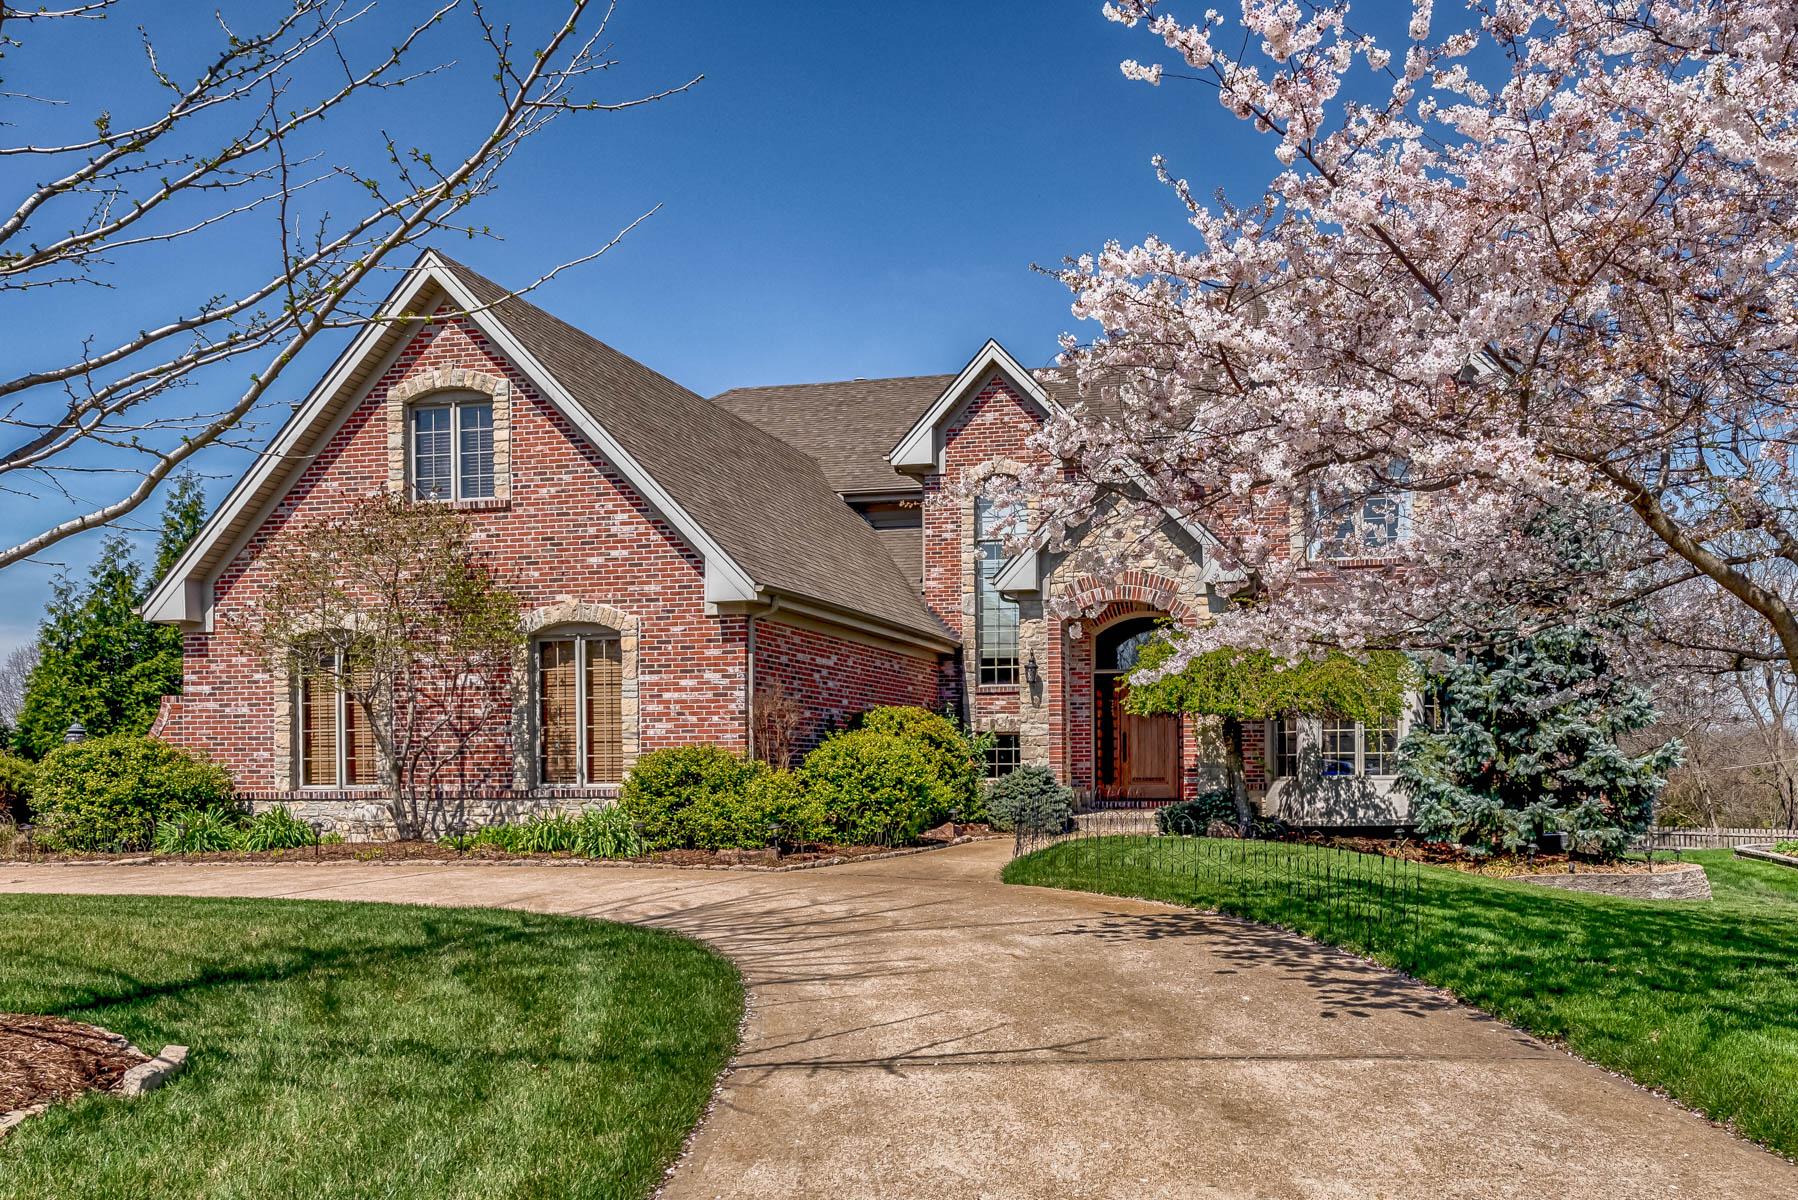 Single Family Home for Sale at Davana 12549 Davana Dr St. Louis, Missouri 63128 United States